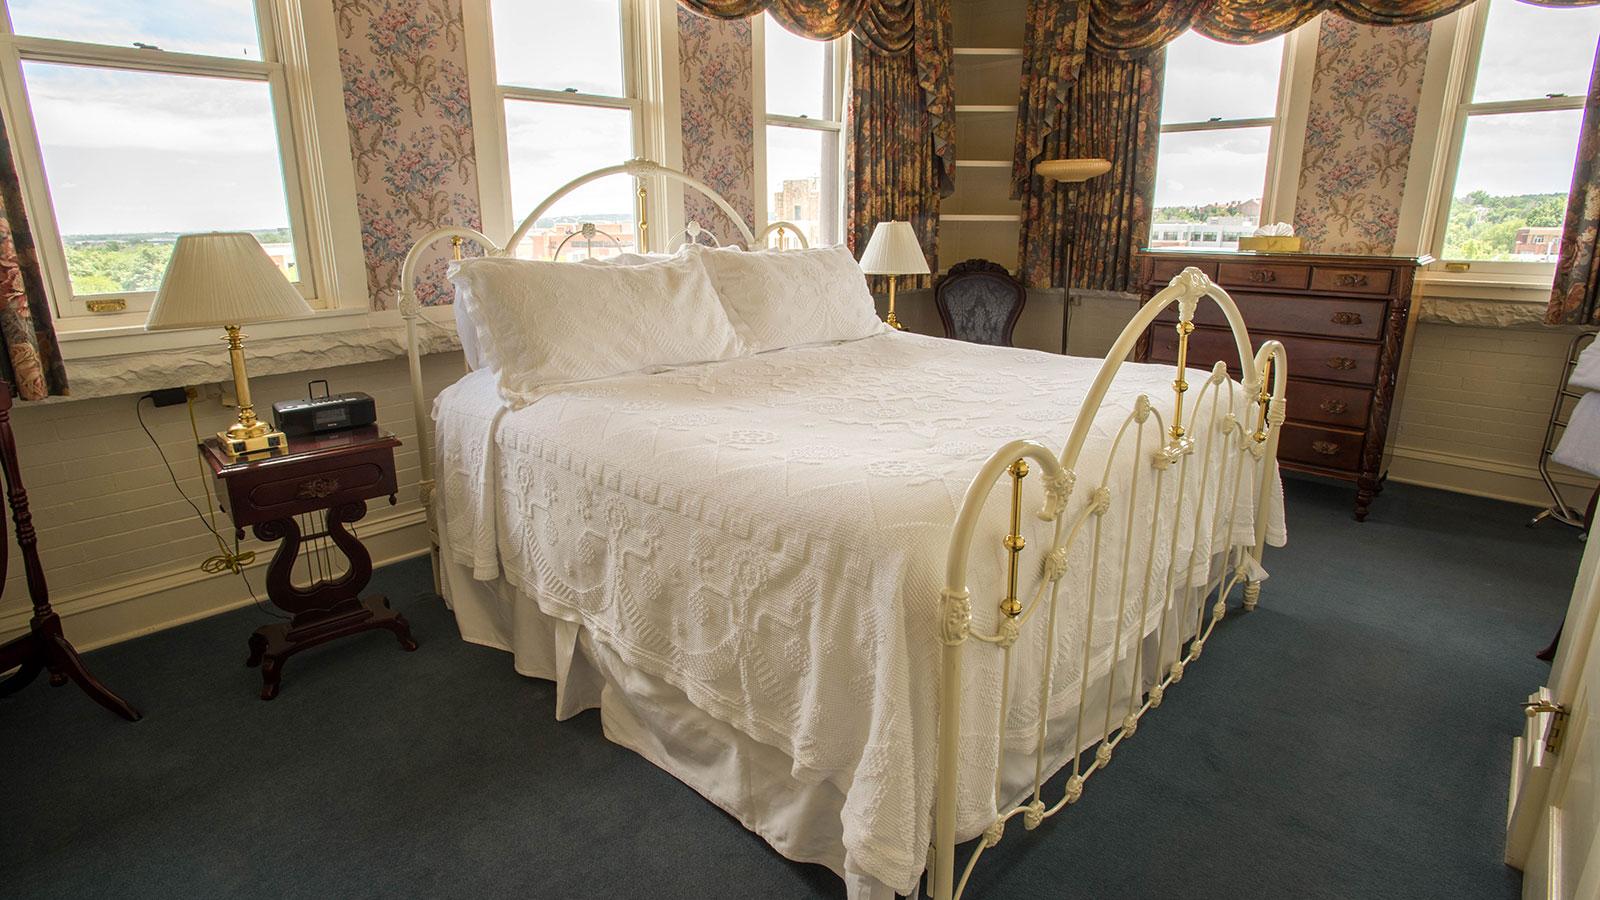 Image of Guestroom Interior, Hotel Boulderado in Boulder, Colorado, 1909, Member of Historic Hotels of America, Accommodations